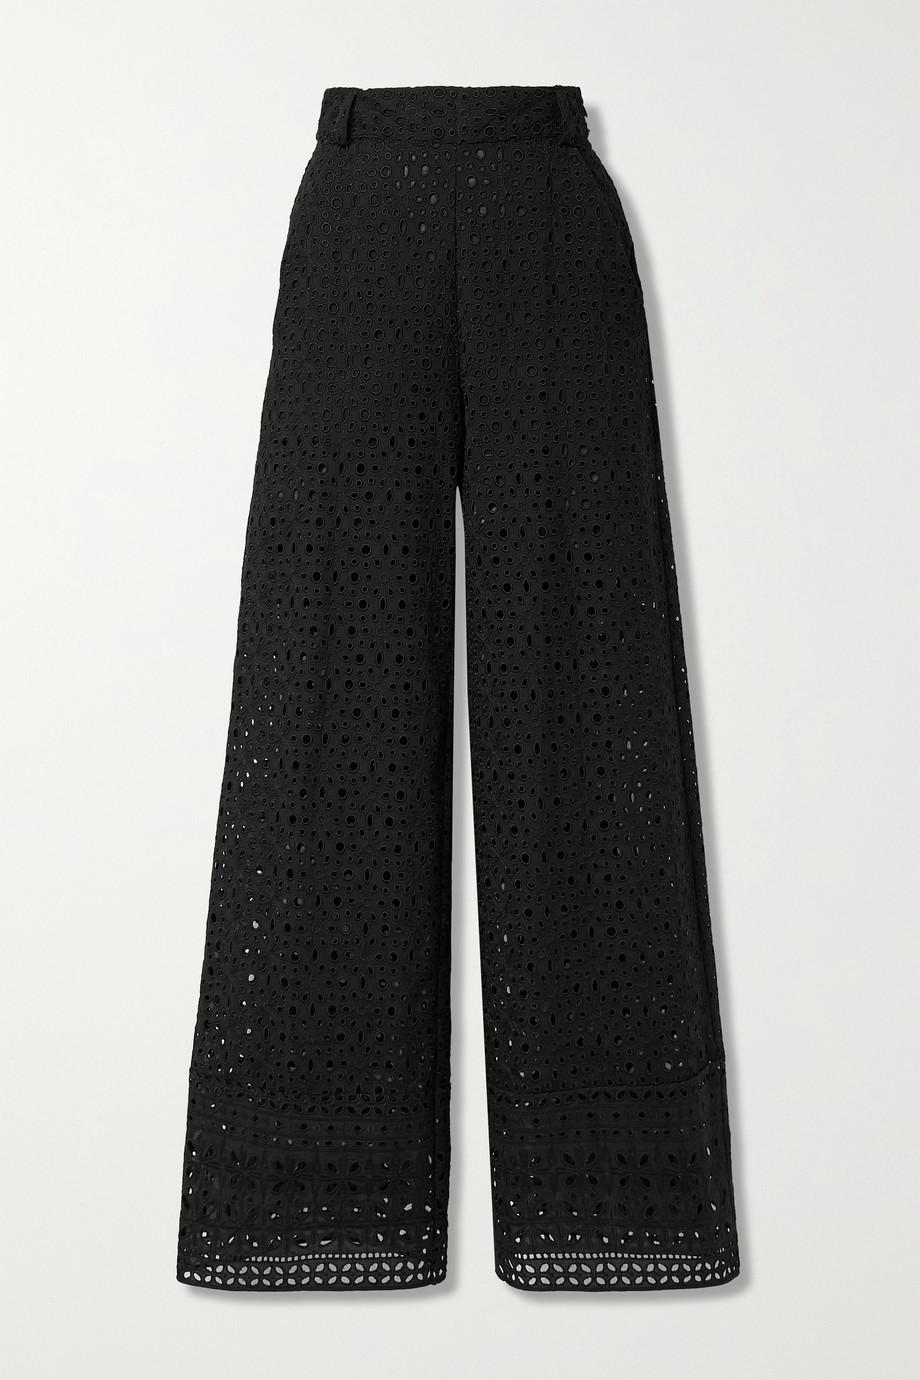 Charo Ruiz Brigid broderie anglaise cotton wide-leg pants